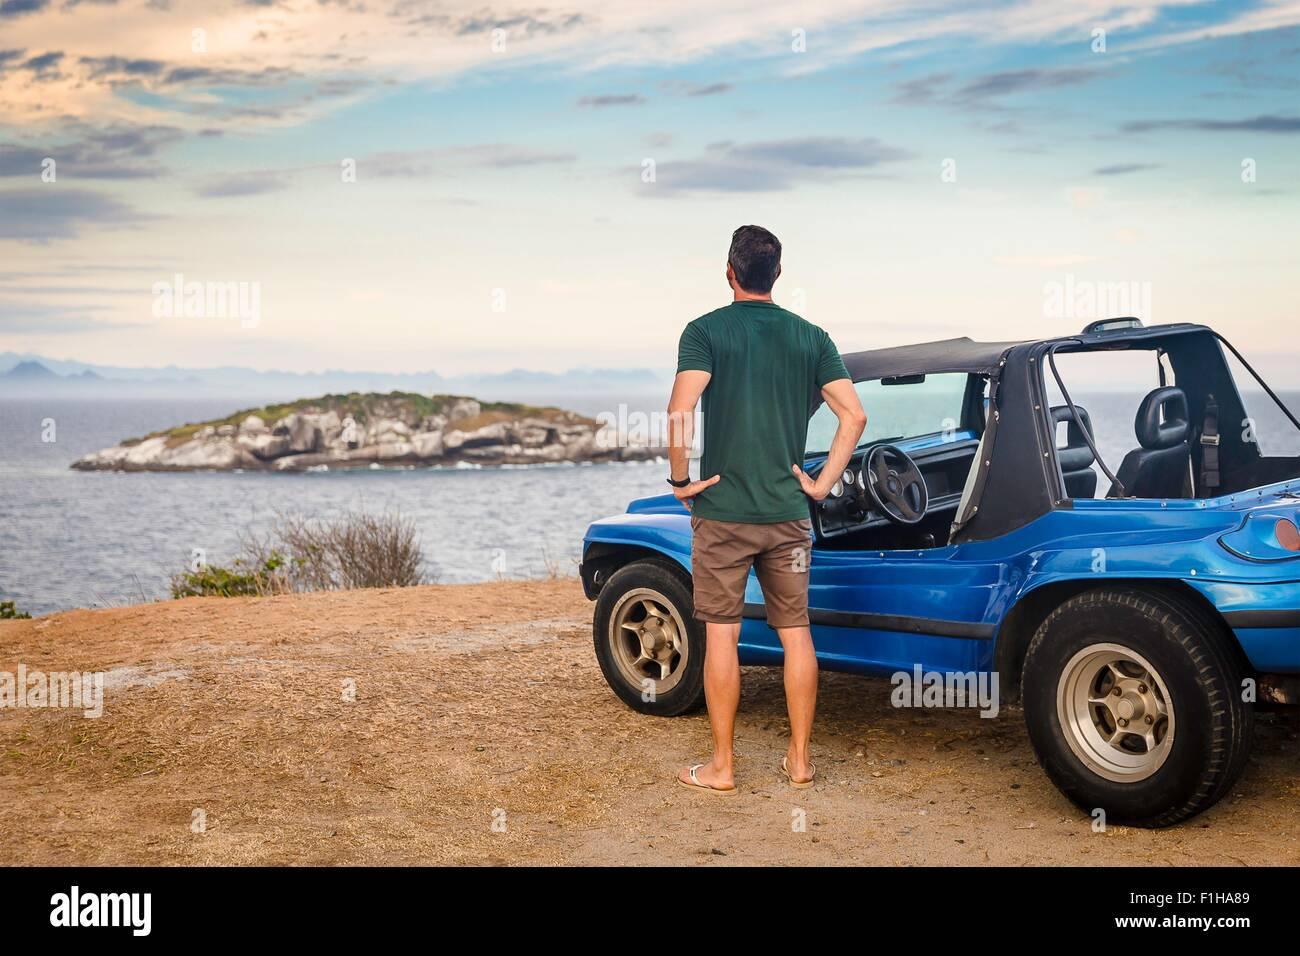 Vista trasera del turista macho mirando a Branca isla, Buzios, Río de Janeiro, Brasil Imagen De Stock